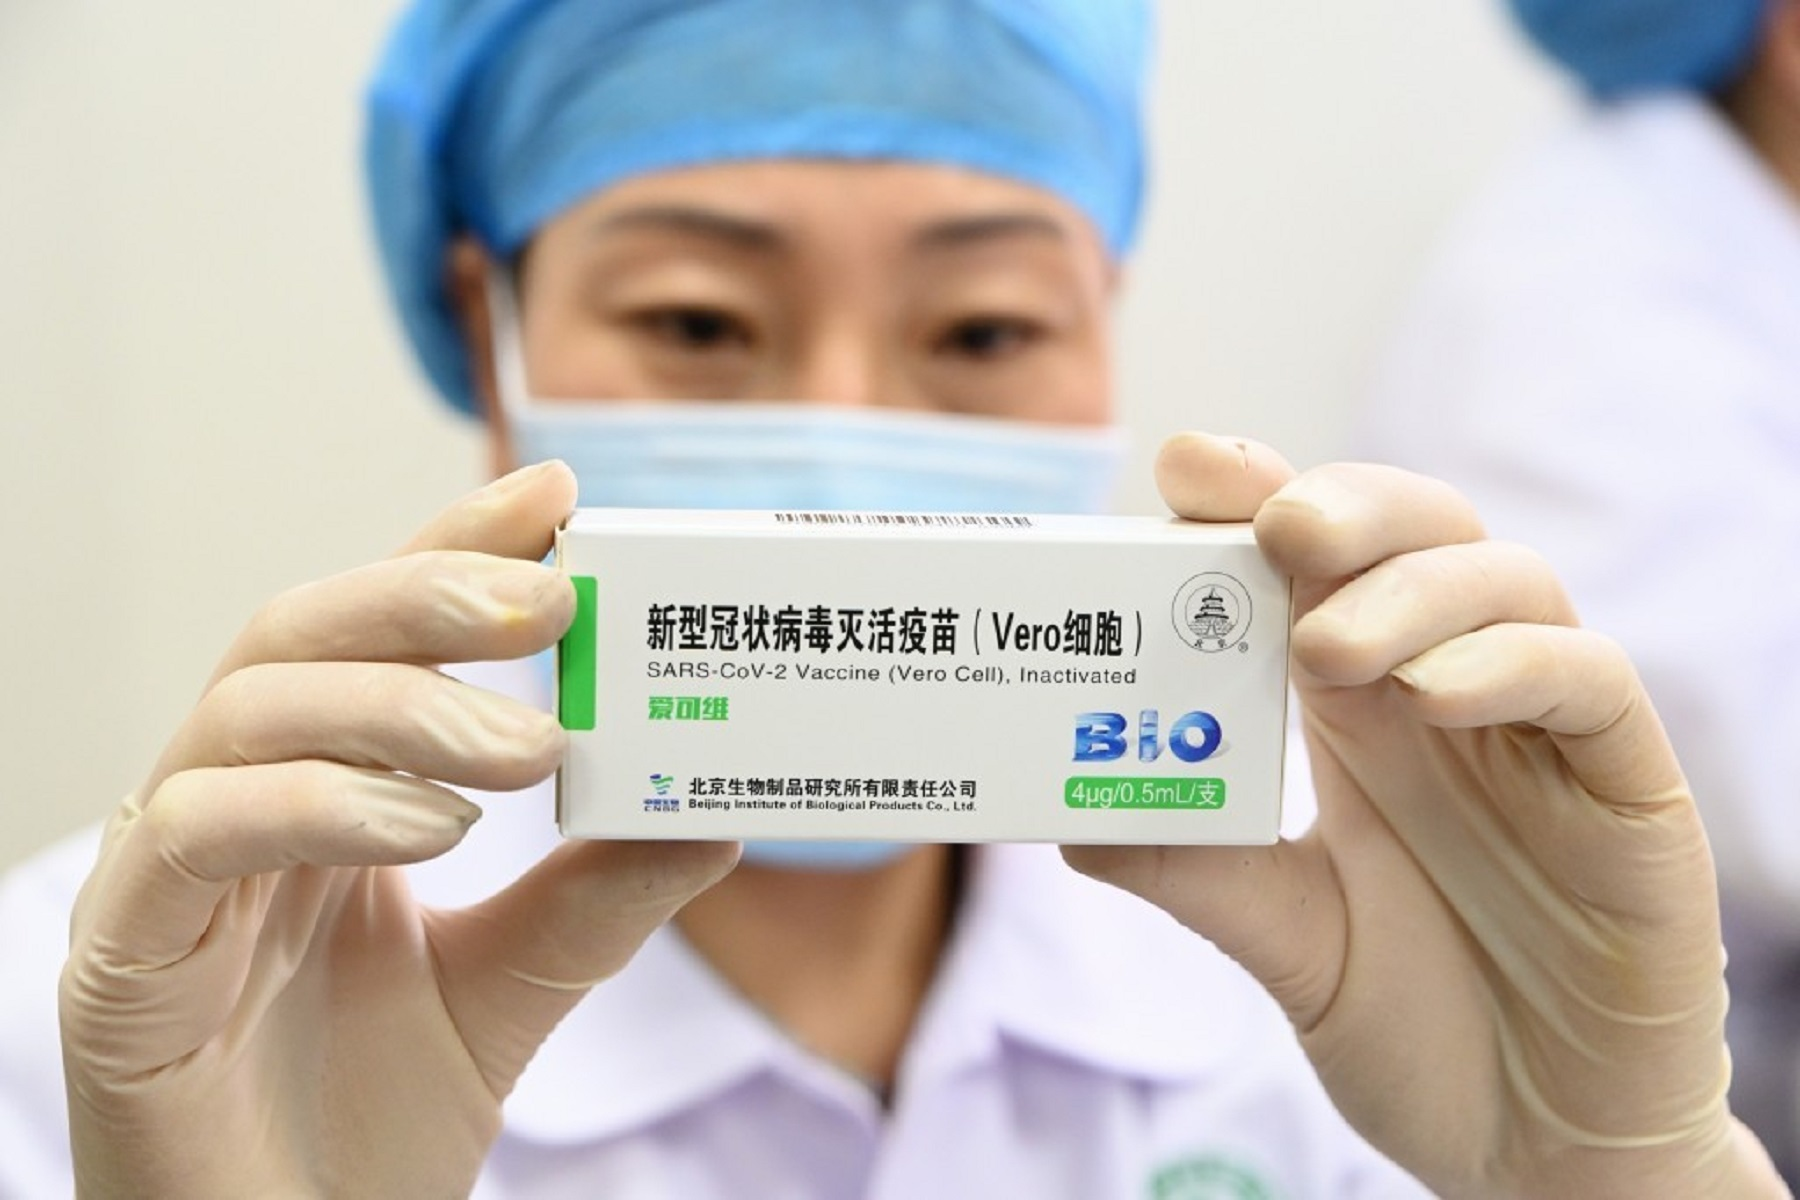 Covid-19 ΠΟΥ: Δίνει πράσινο φως στο εμβόλιο του Πεκίνου